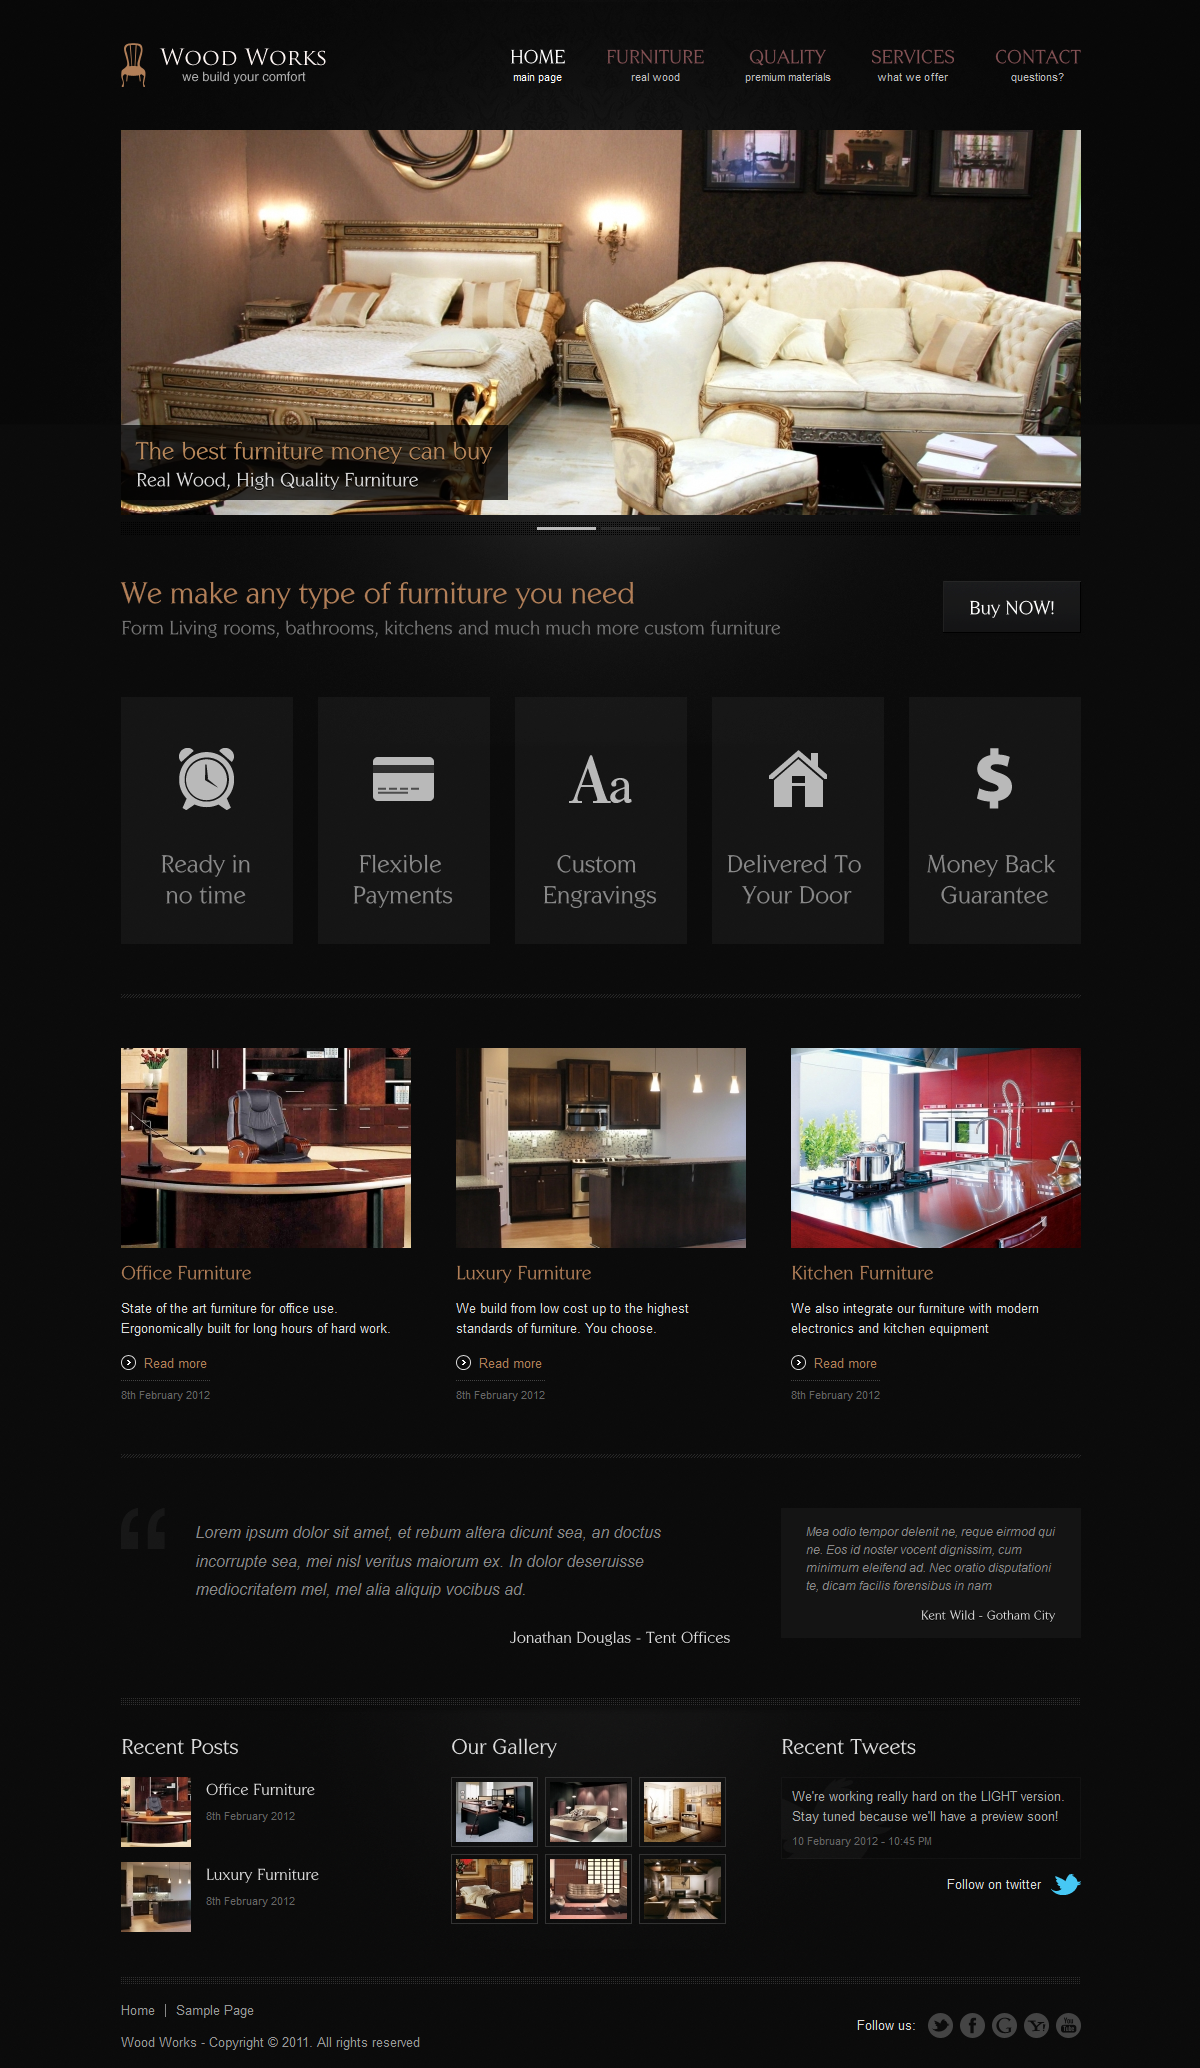 reFresh - Powerful Clean & Elegant WordPress Theme - Wood Works - Furniture - Demo - Showcase